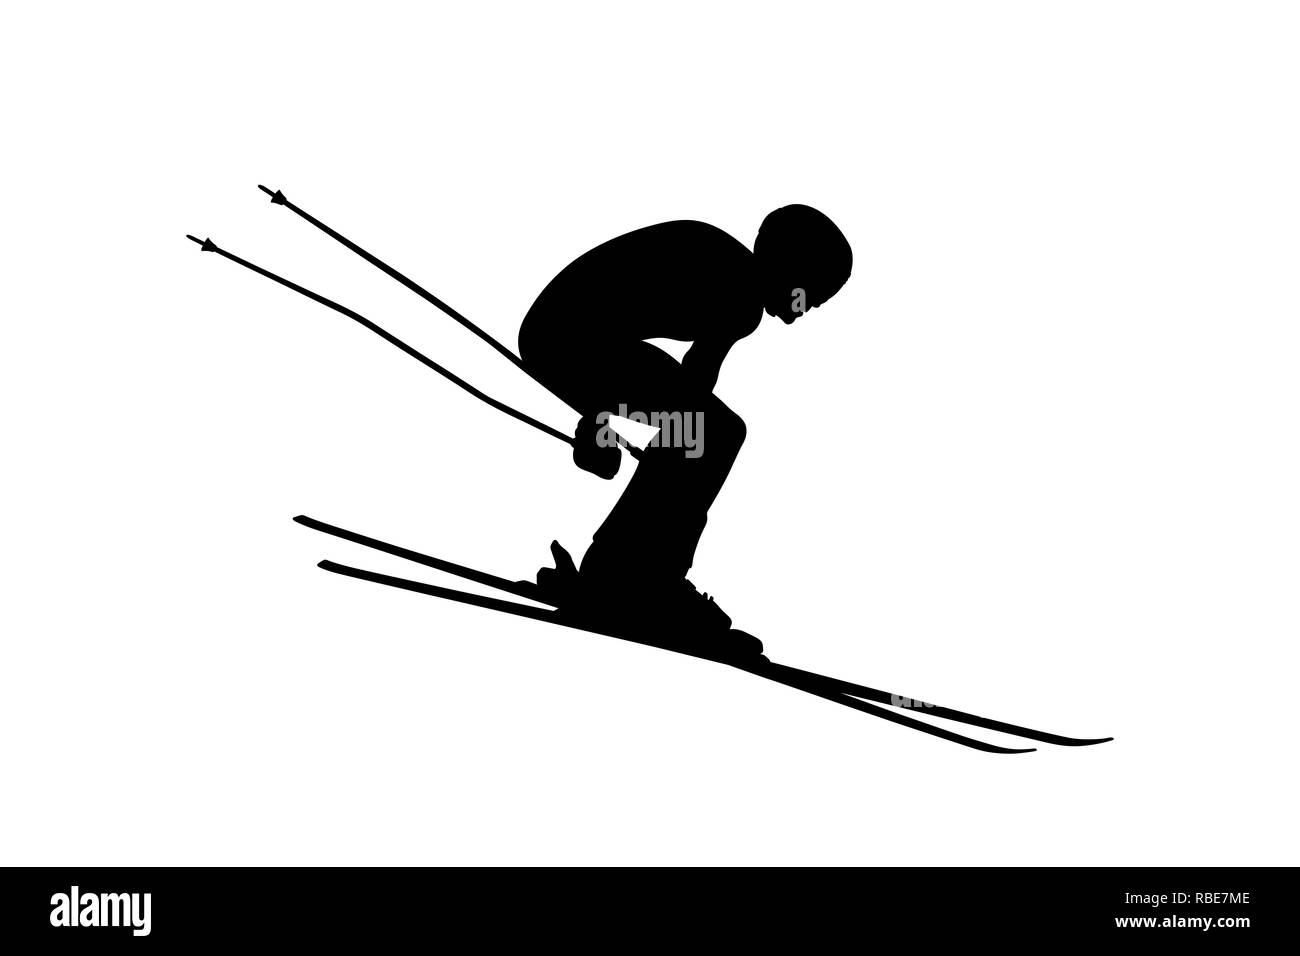 winter sport alpine skiing men athlete downhill - Stock Image